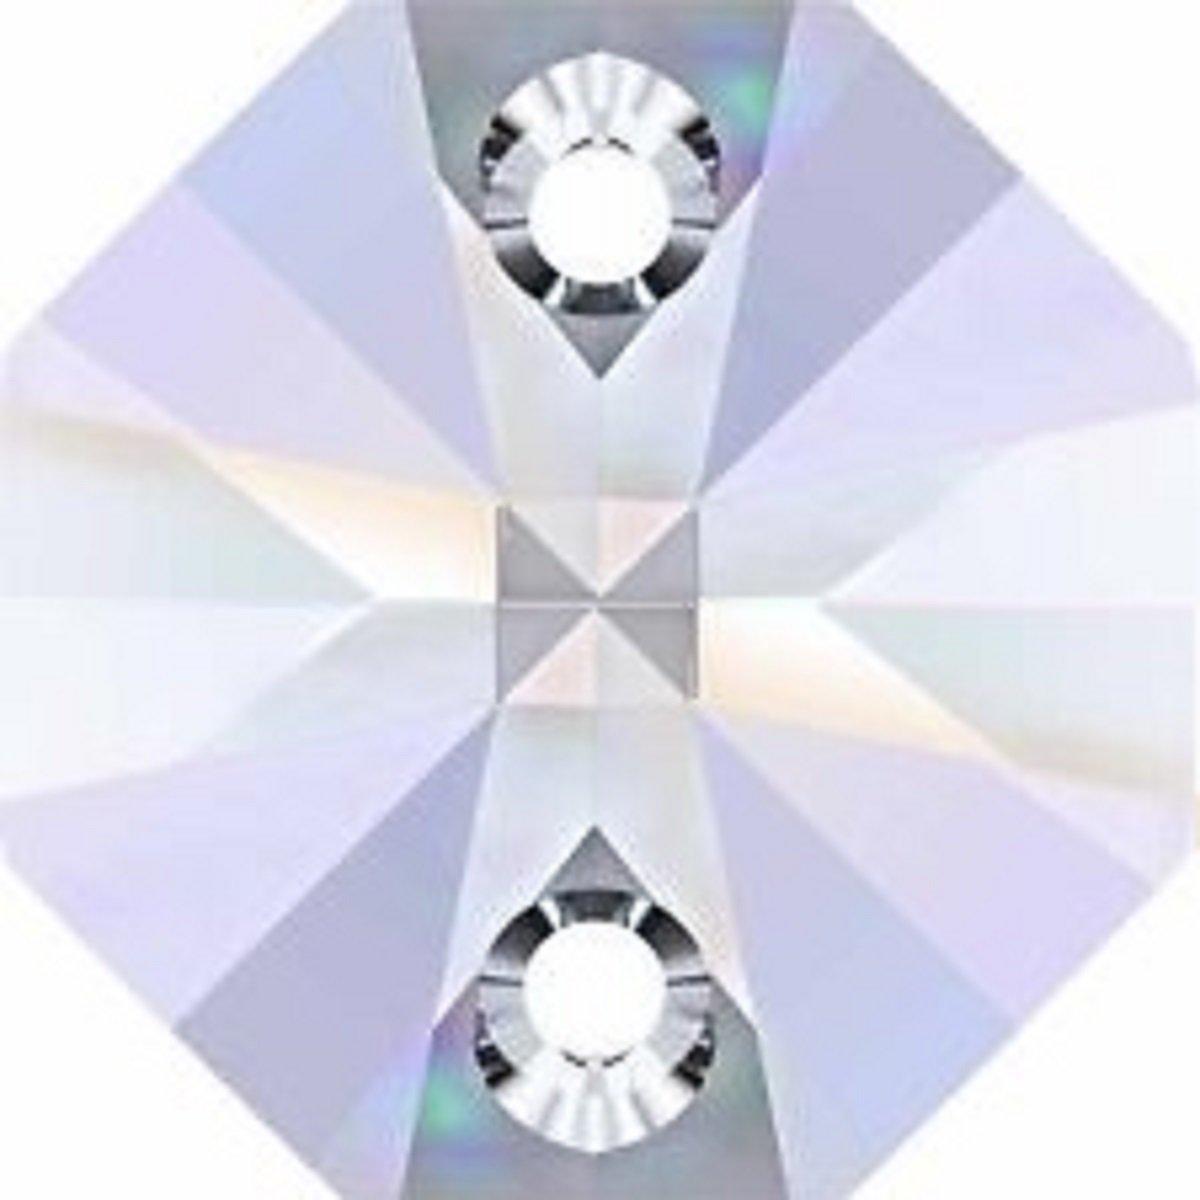 Swarovski Spectra Octagon 28 mm 2 gats per 150 stuks kopen